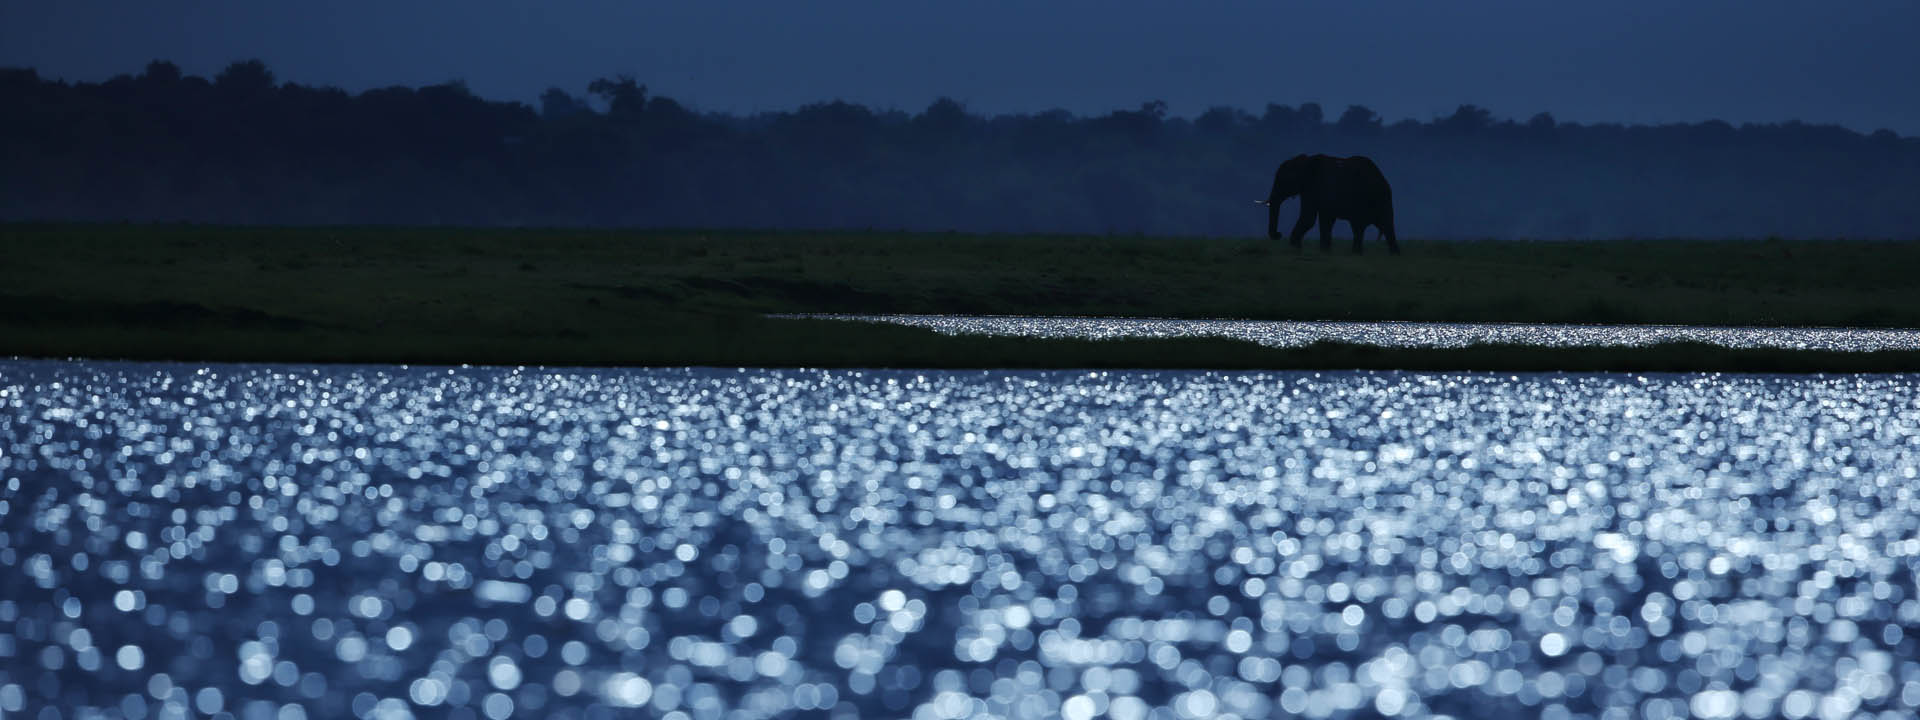 Elefant abends am Chobe